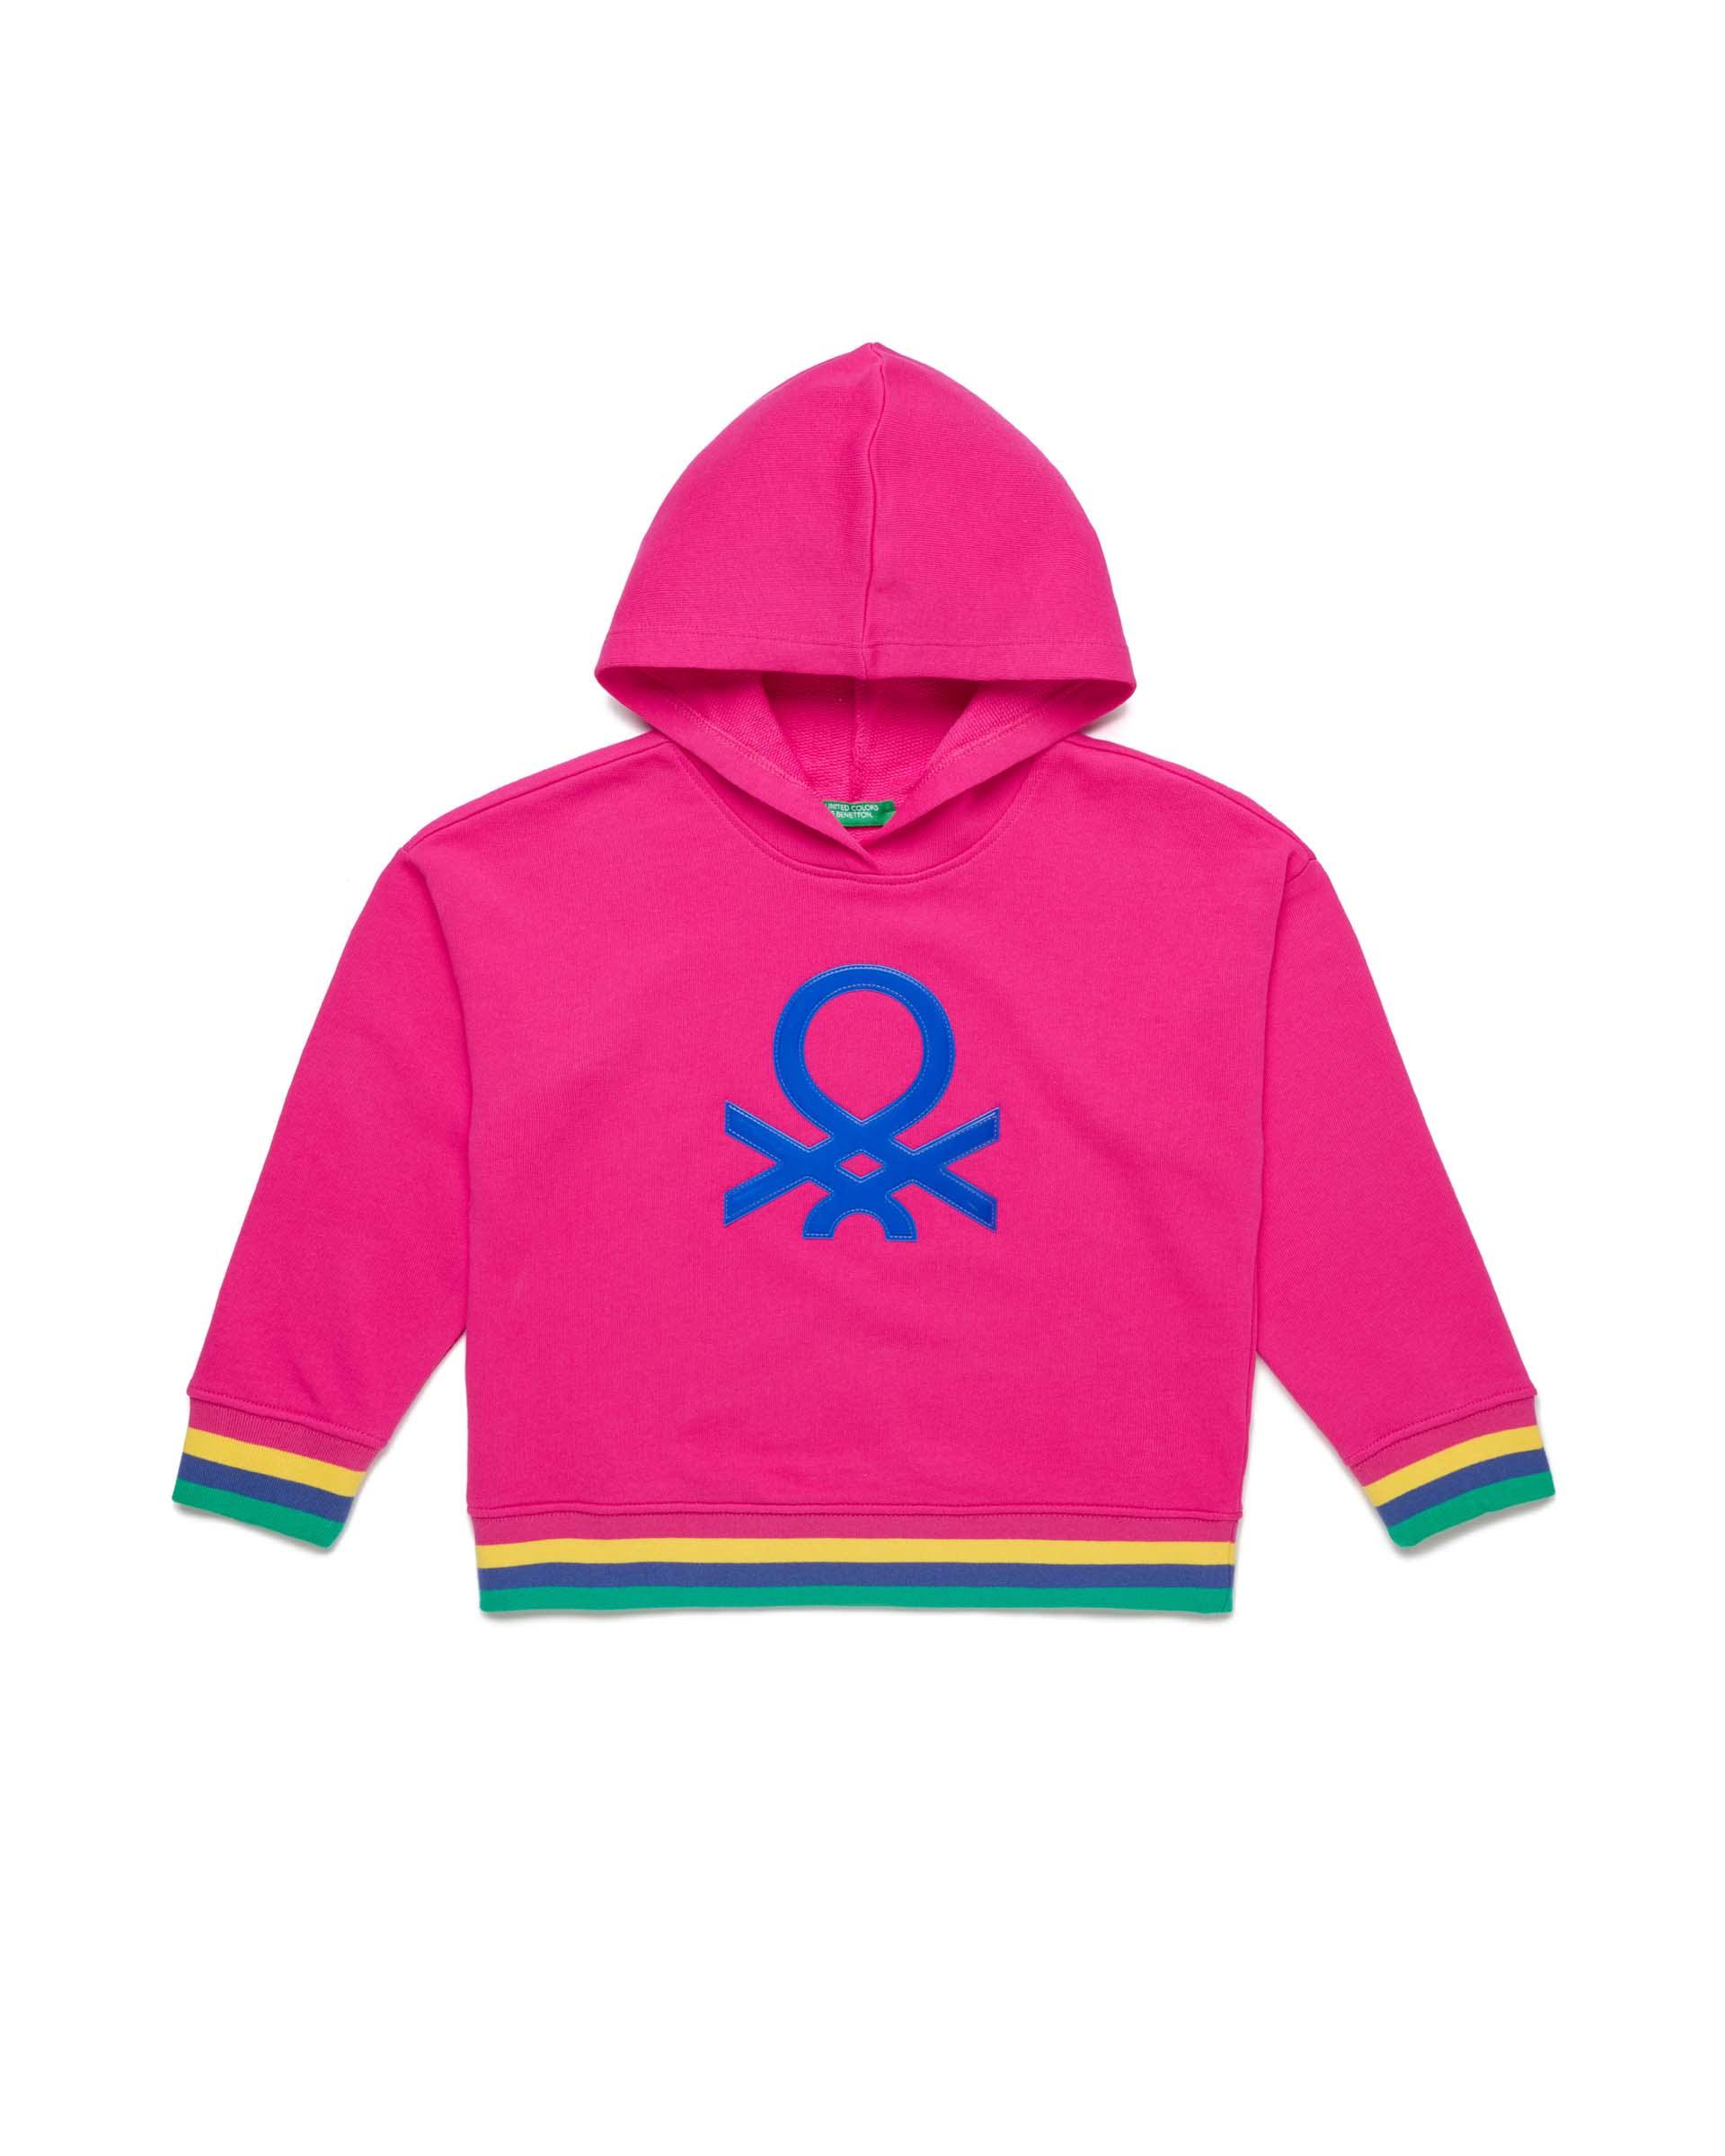 Купить 20P_3J68C2175_2L3, Толстовка для девочек Benetton 3J68C2175_2L3 р-р 122, United Colors of Benetton, Толстовки для девочек